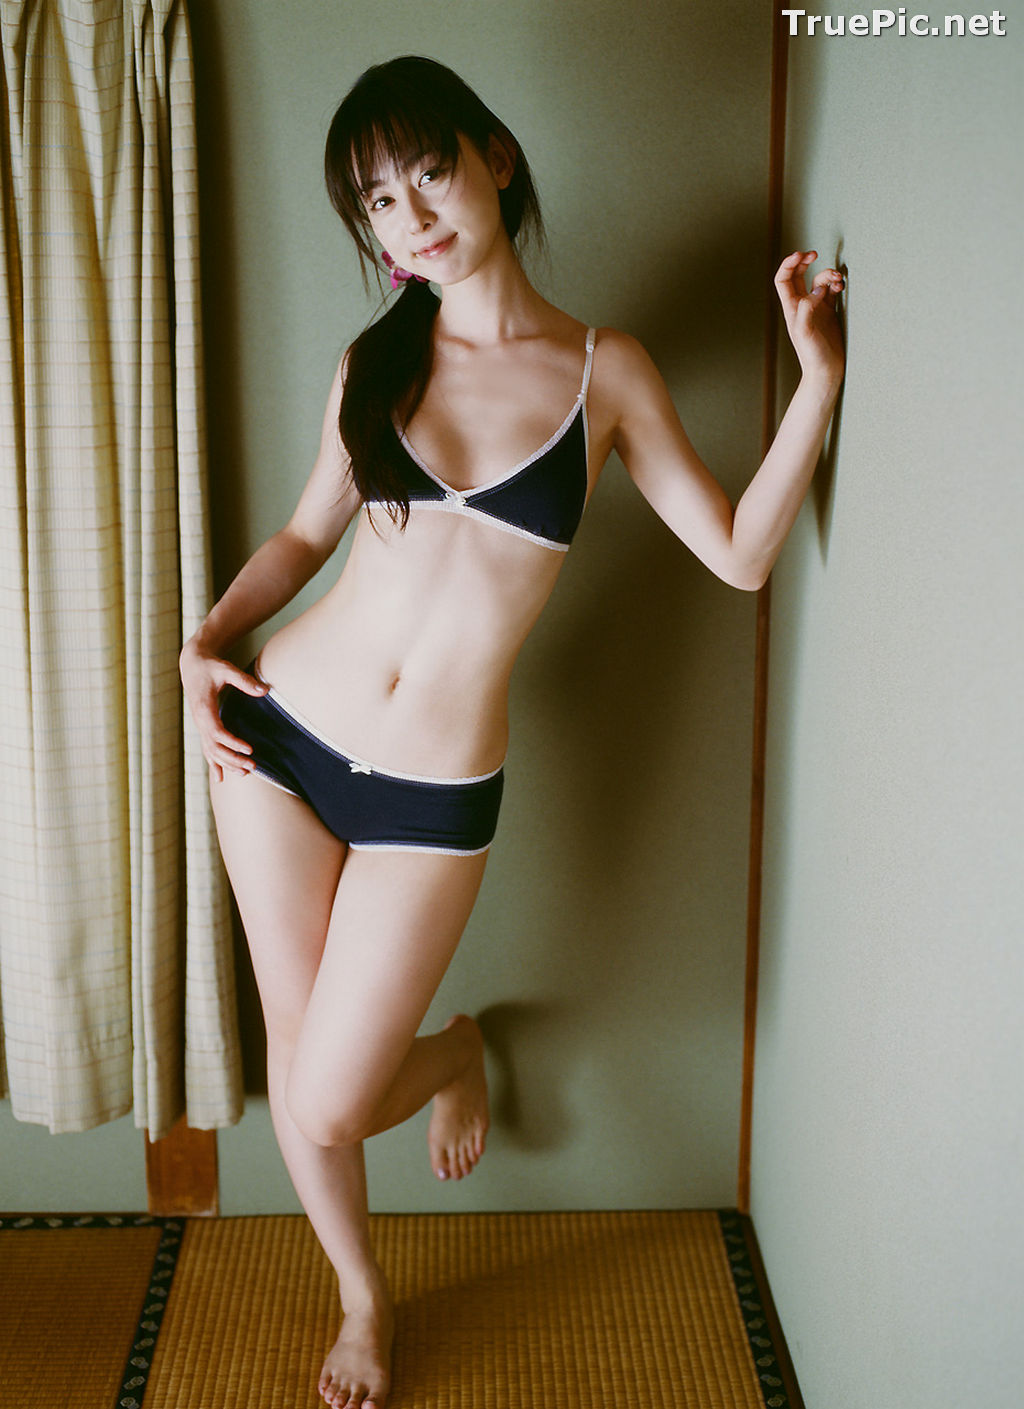 Image Image-TV Album Waiting for Me - Japanese Actress and Gravure Idol - Rina Akiyama - TruePic.net - Picture-10